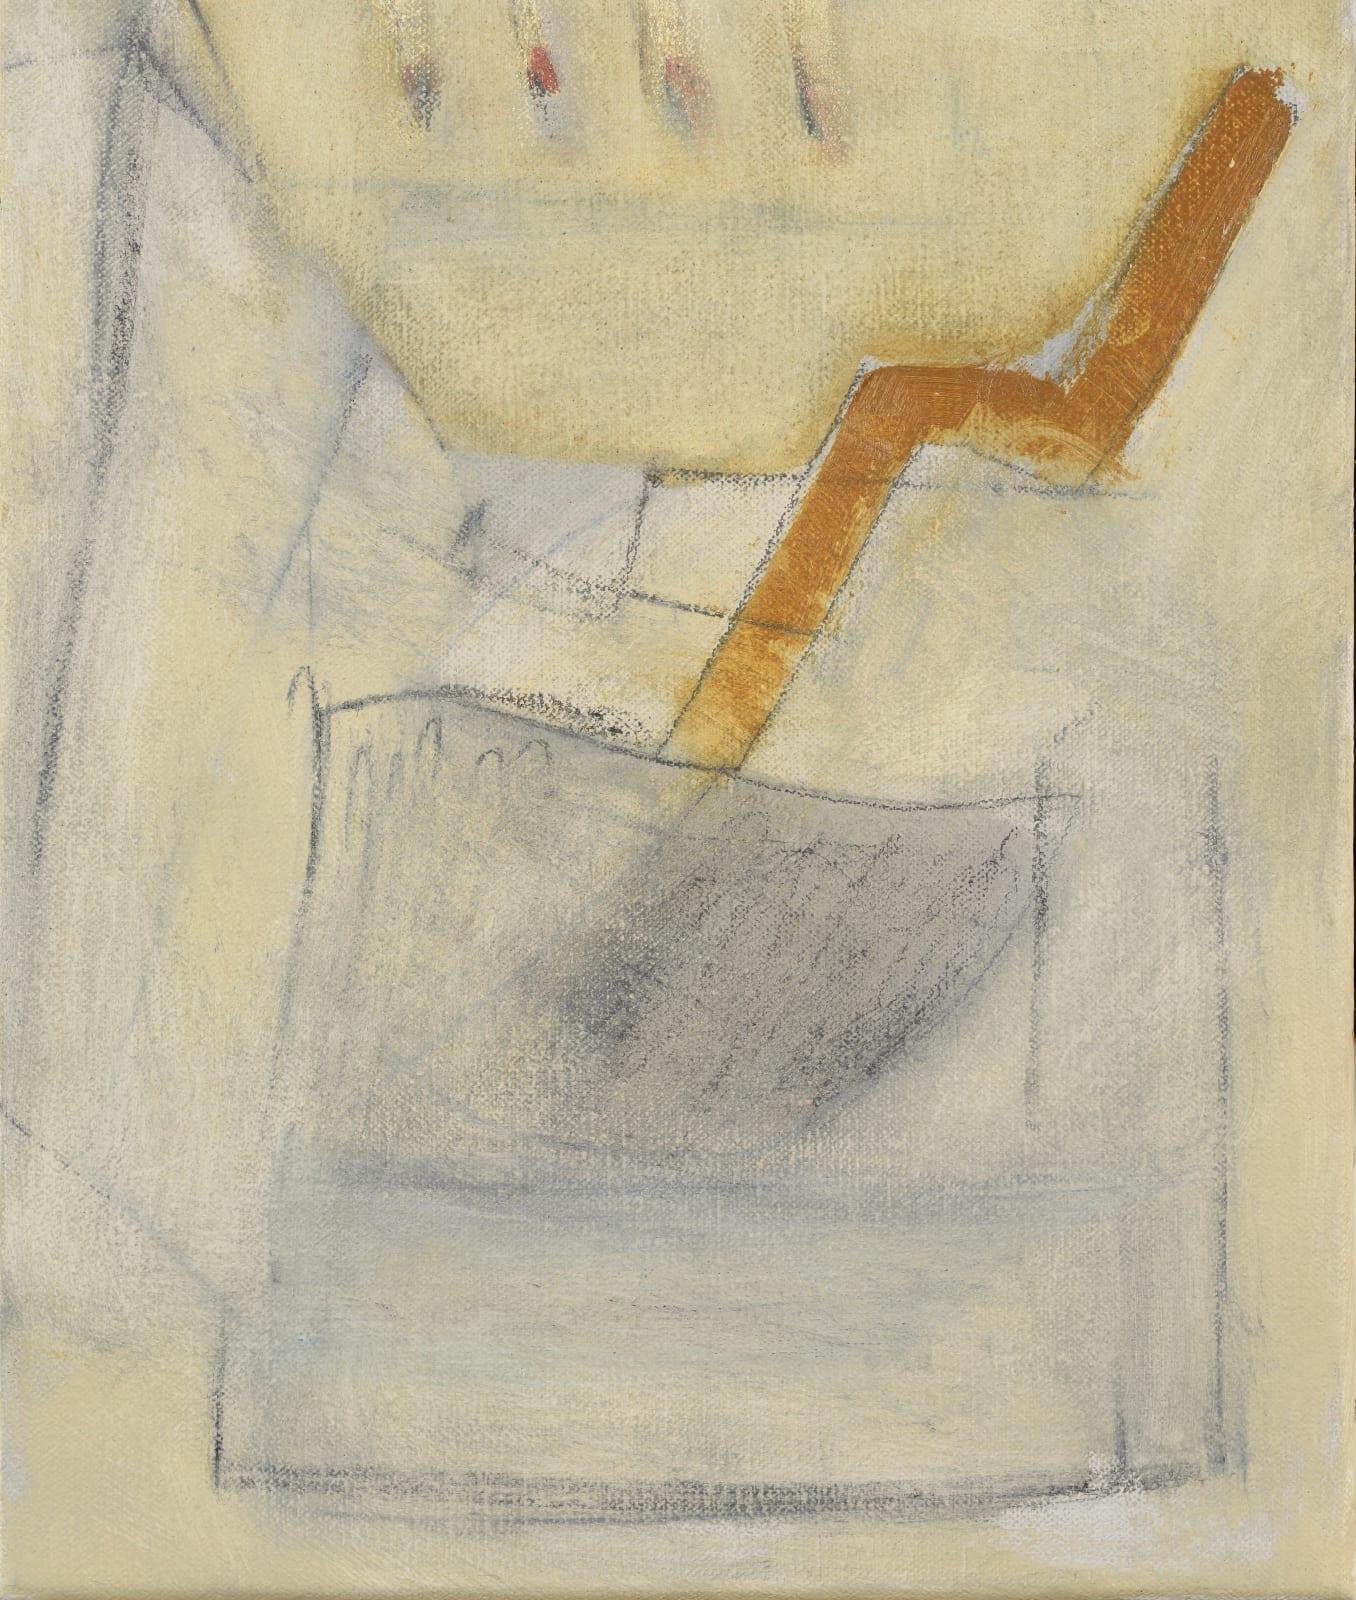 Frank Phelan, Cave II